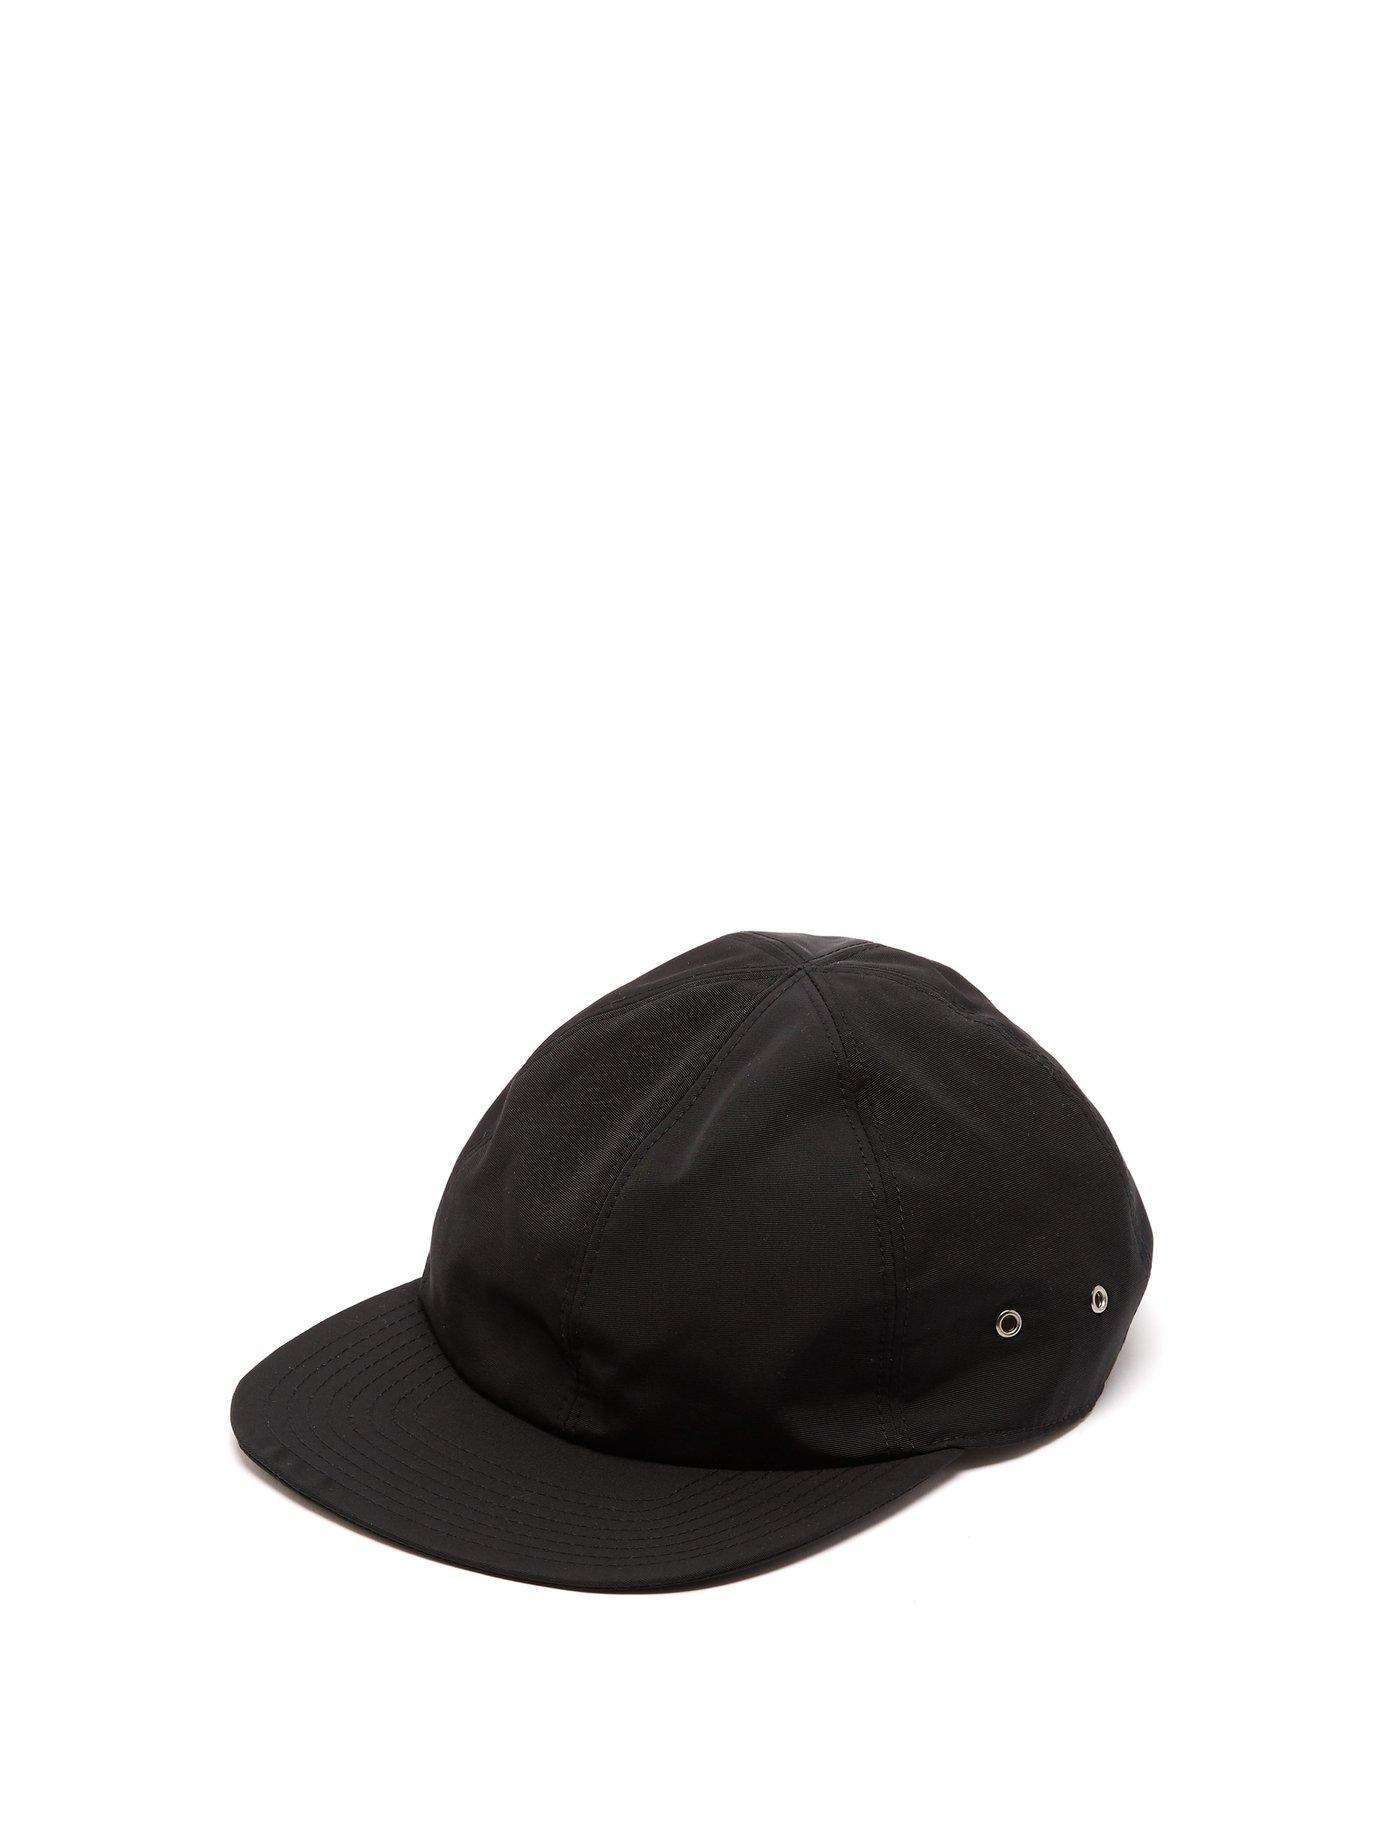 f17c2c2ee8c19 Lyst - 1017 ALYX 9SM Technical Twill Baseball Cap in Black for Men